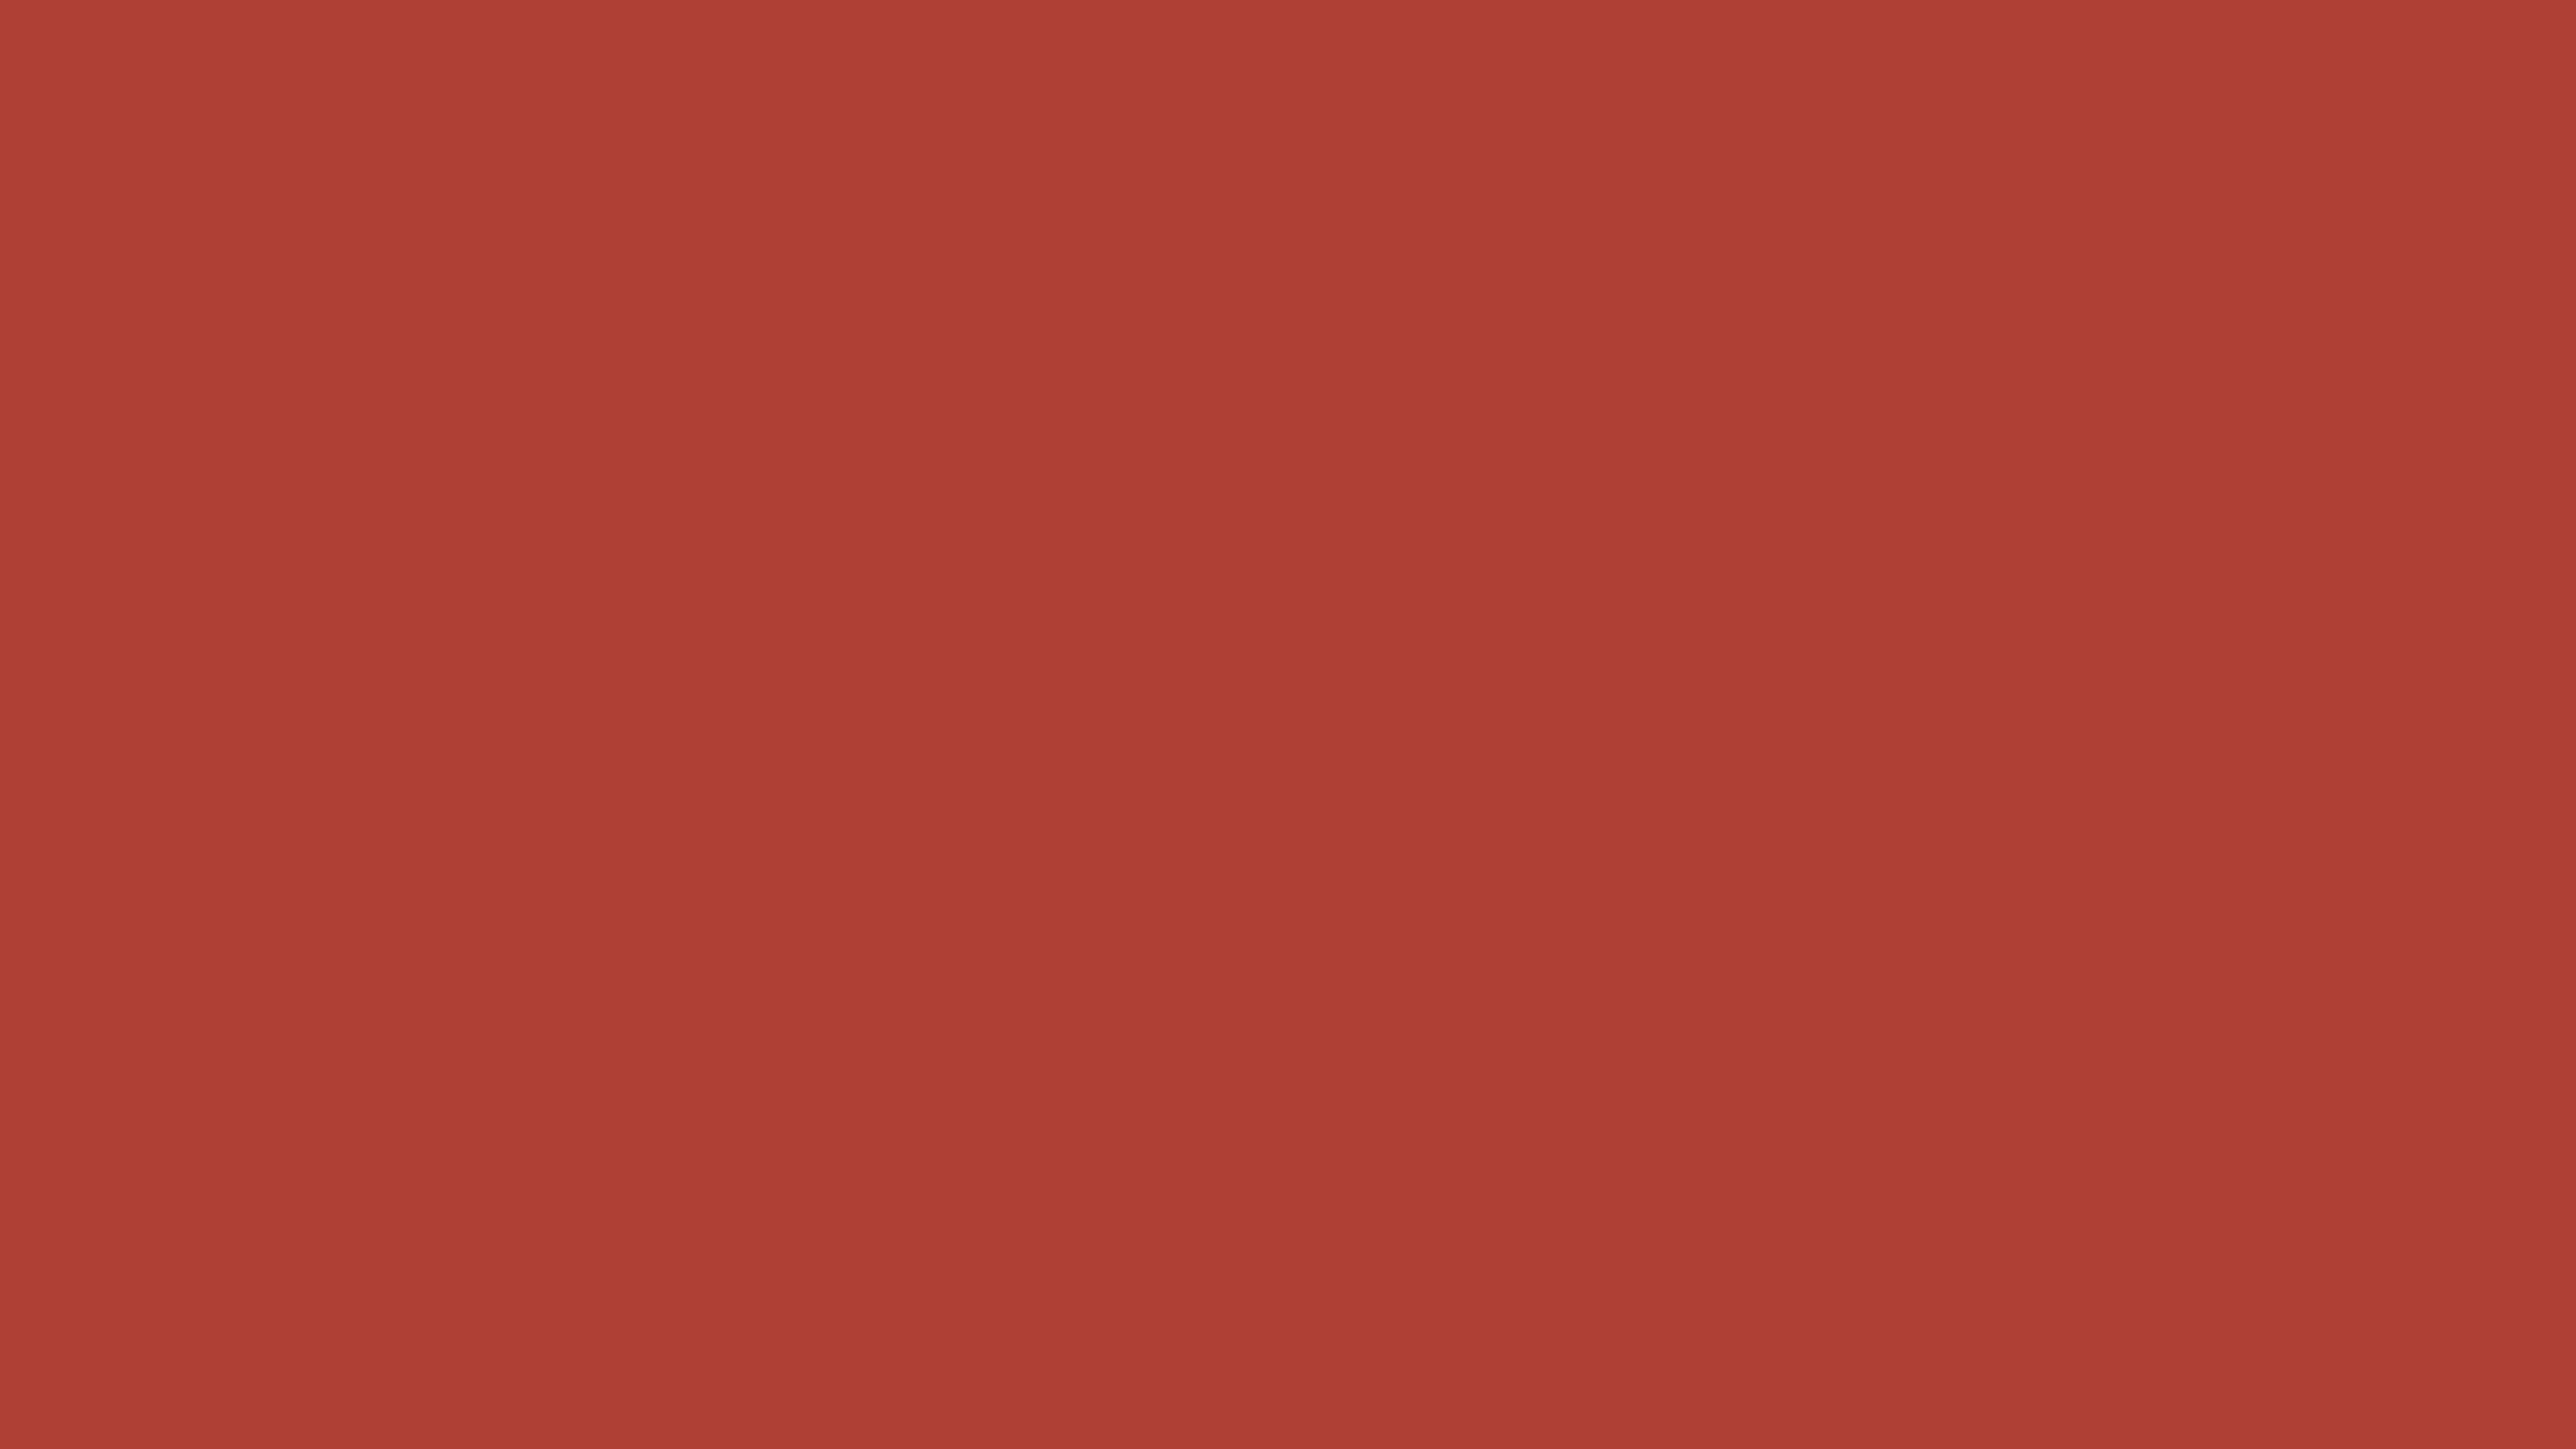 4096x2304 Medium Carmine Solid Color Background